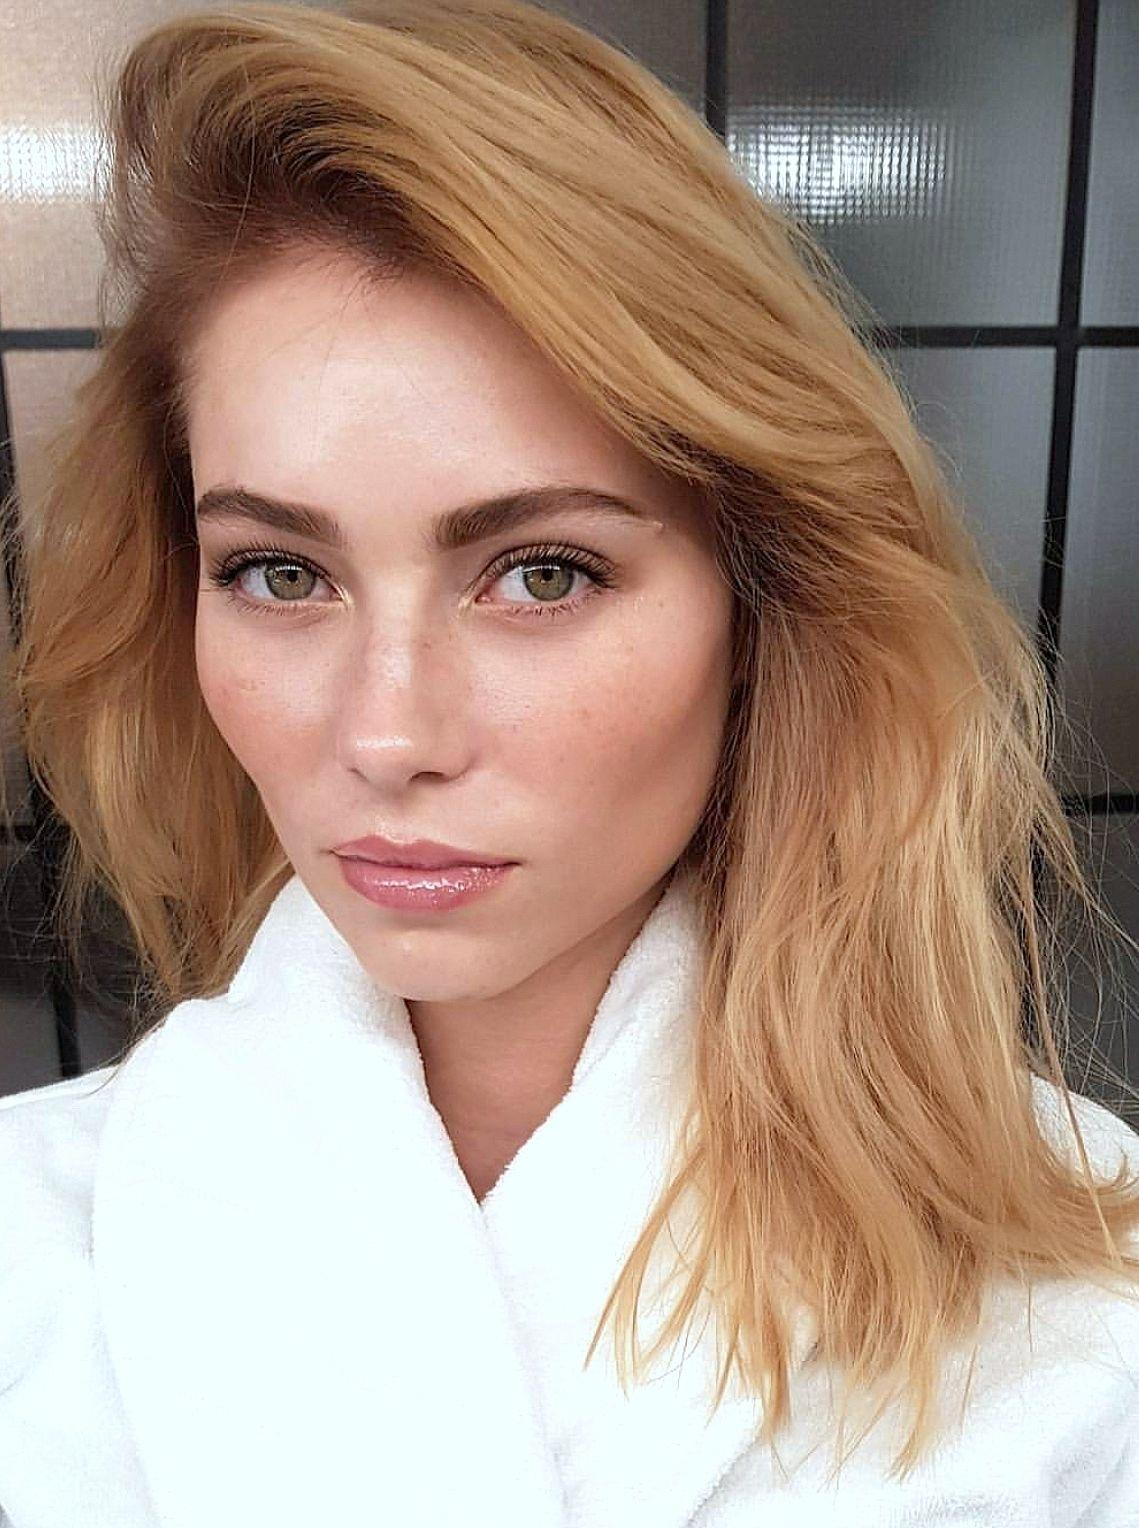 eye makeup for hazel eyes and strawberry blonde hair - wavy